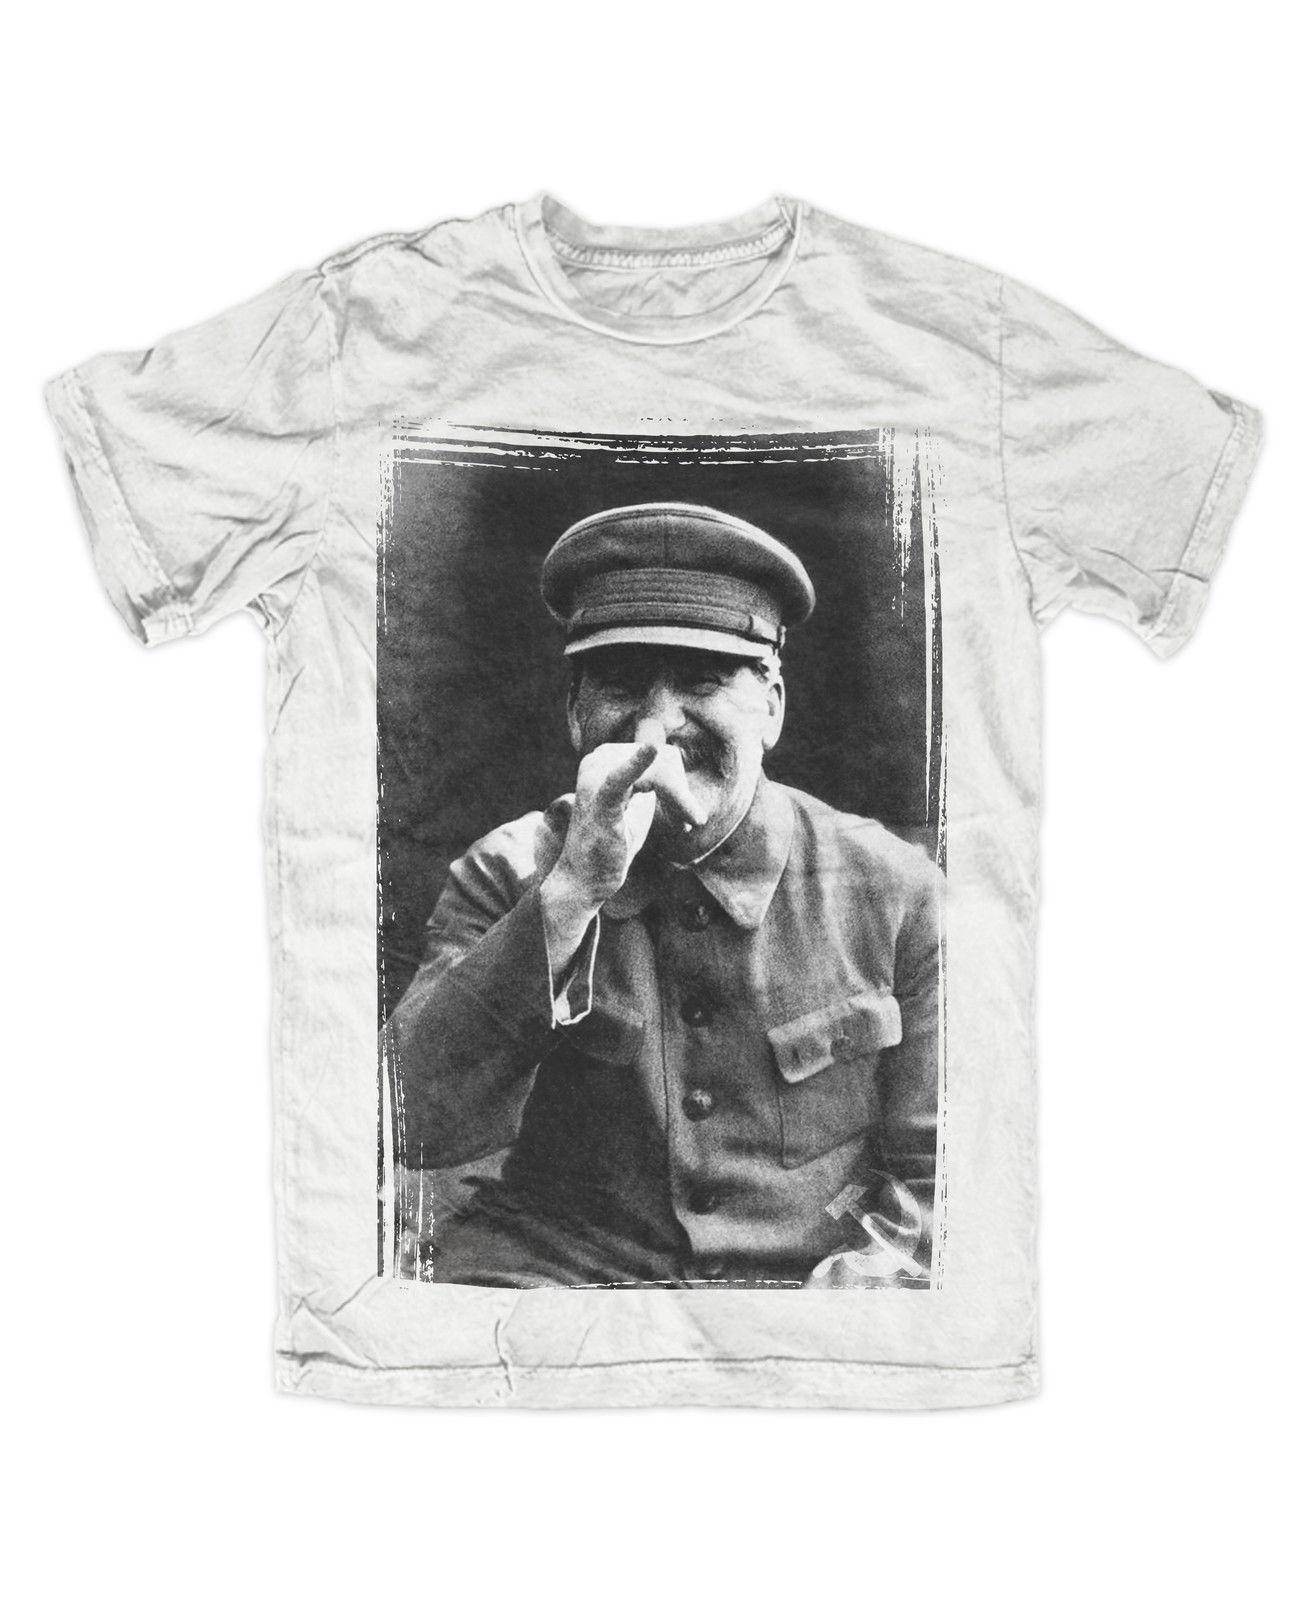 King Krule tee Indie rock rapper Zoo Kid S M L XL 2XL 3XL T shirt ... e0c4c73c9883